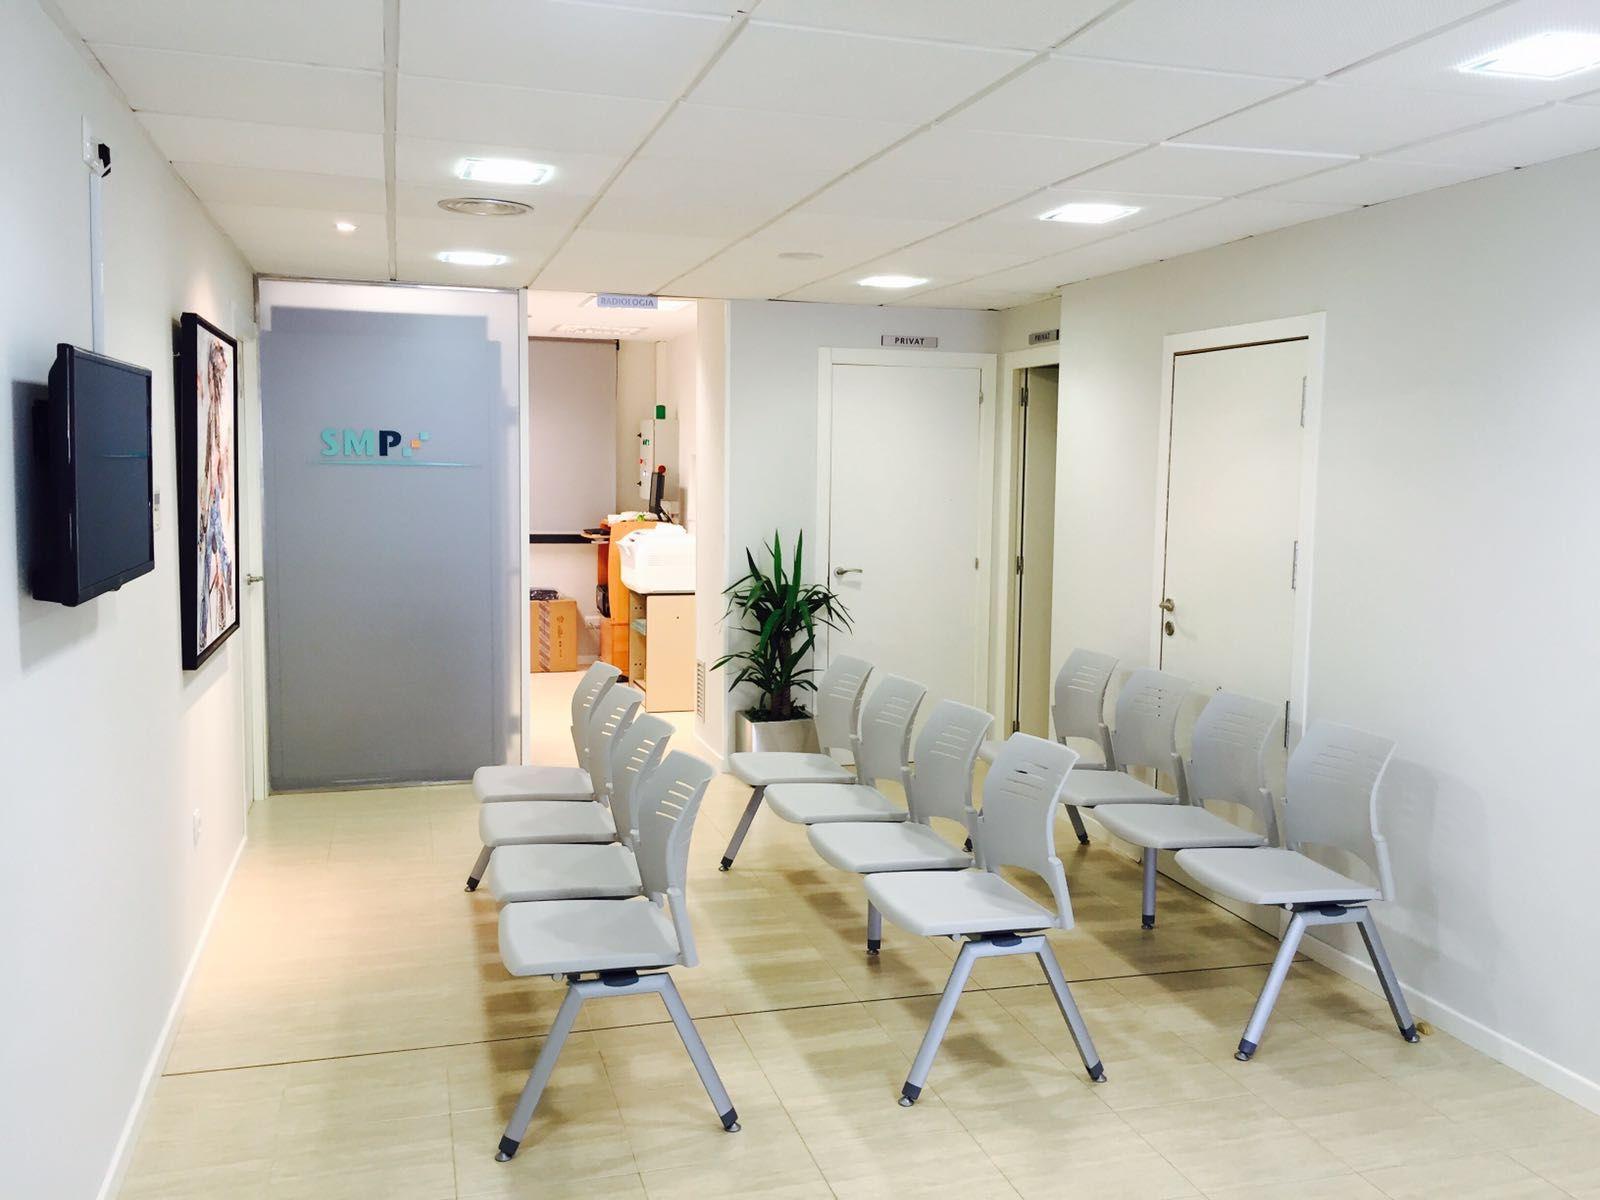 Centros sanitarios de referencia